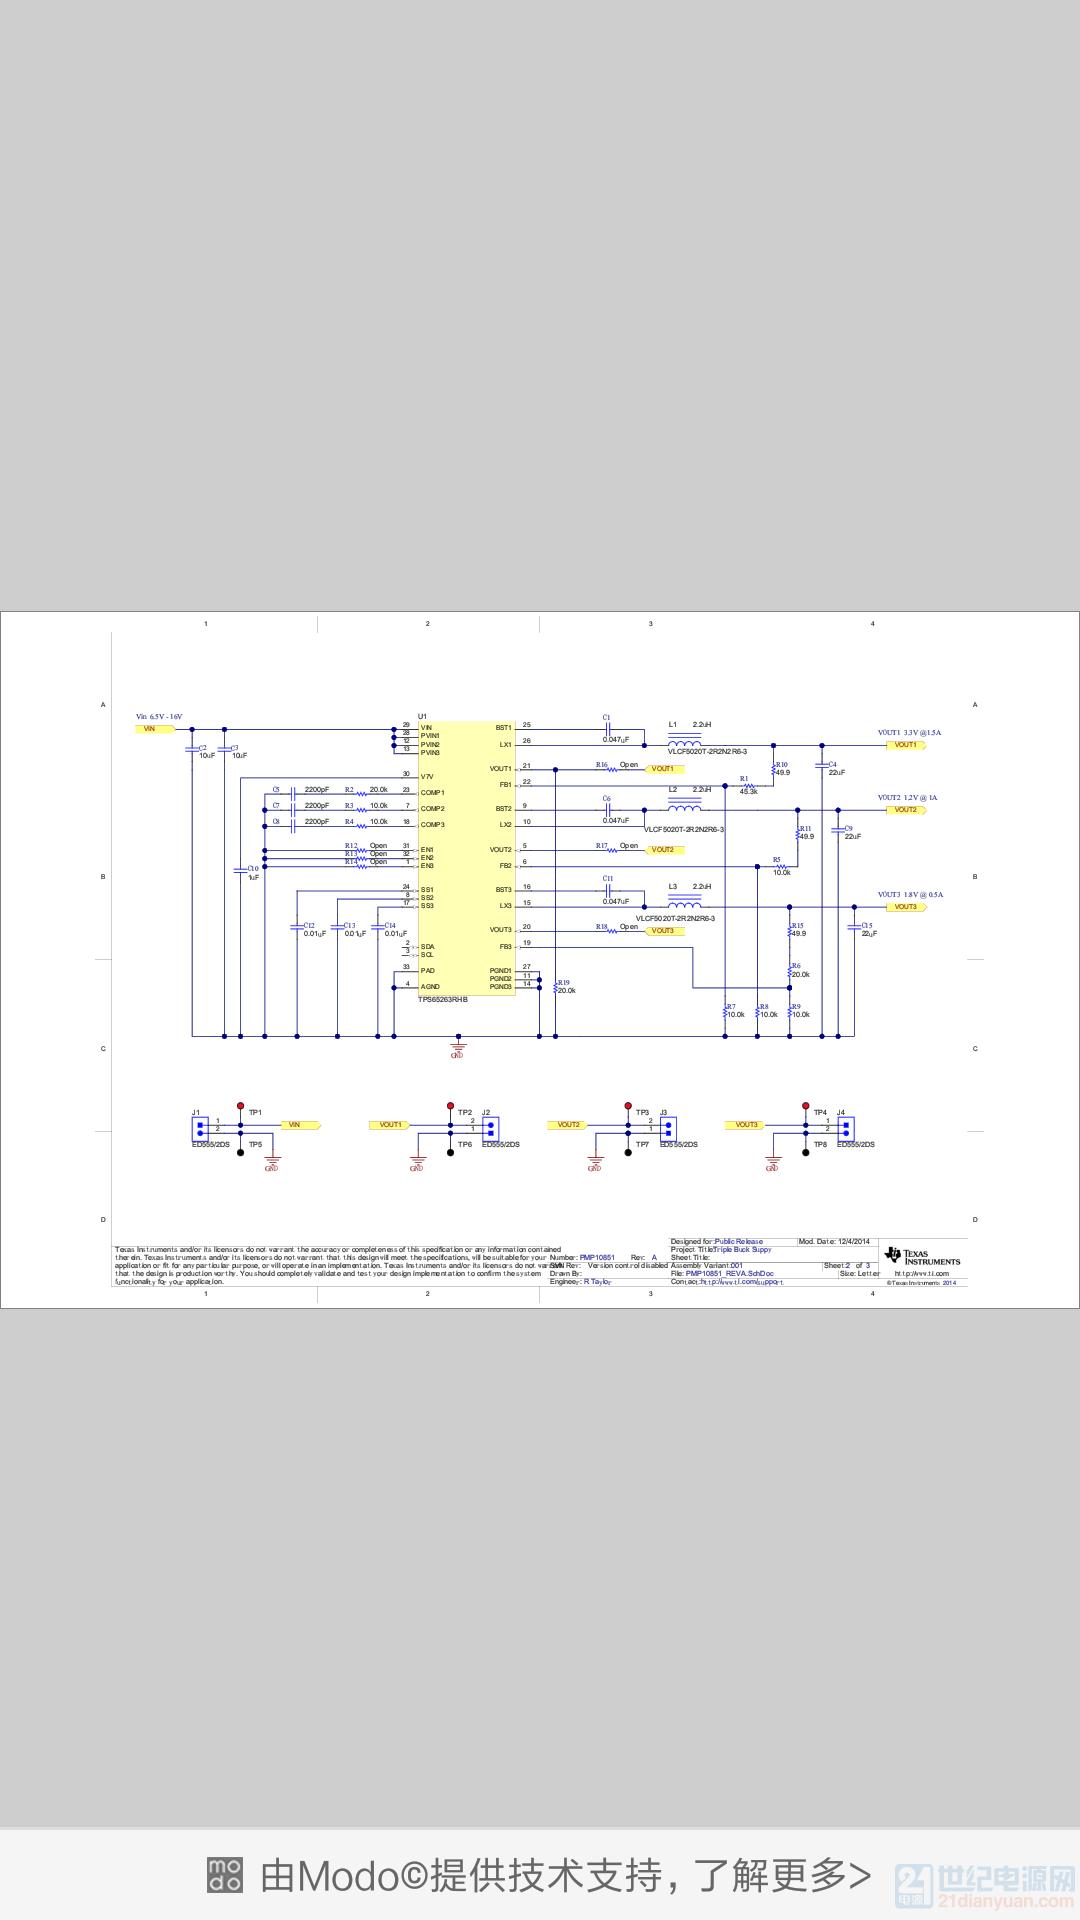 Screenshot_2019-12-29-12-20-07-517_com.UCMobile.png